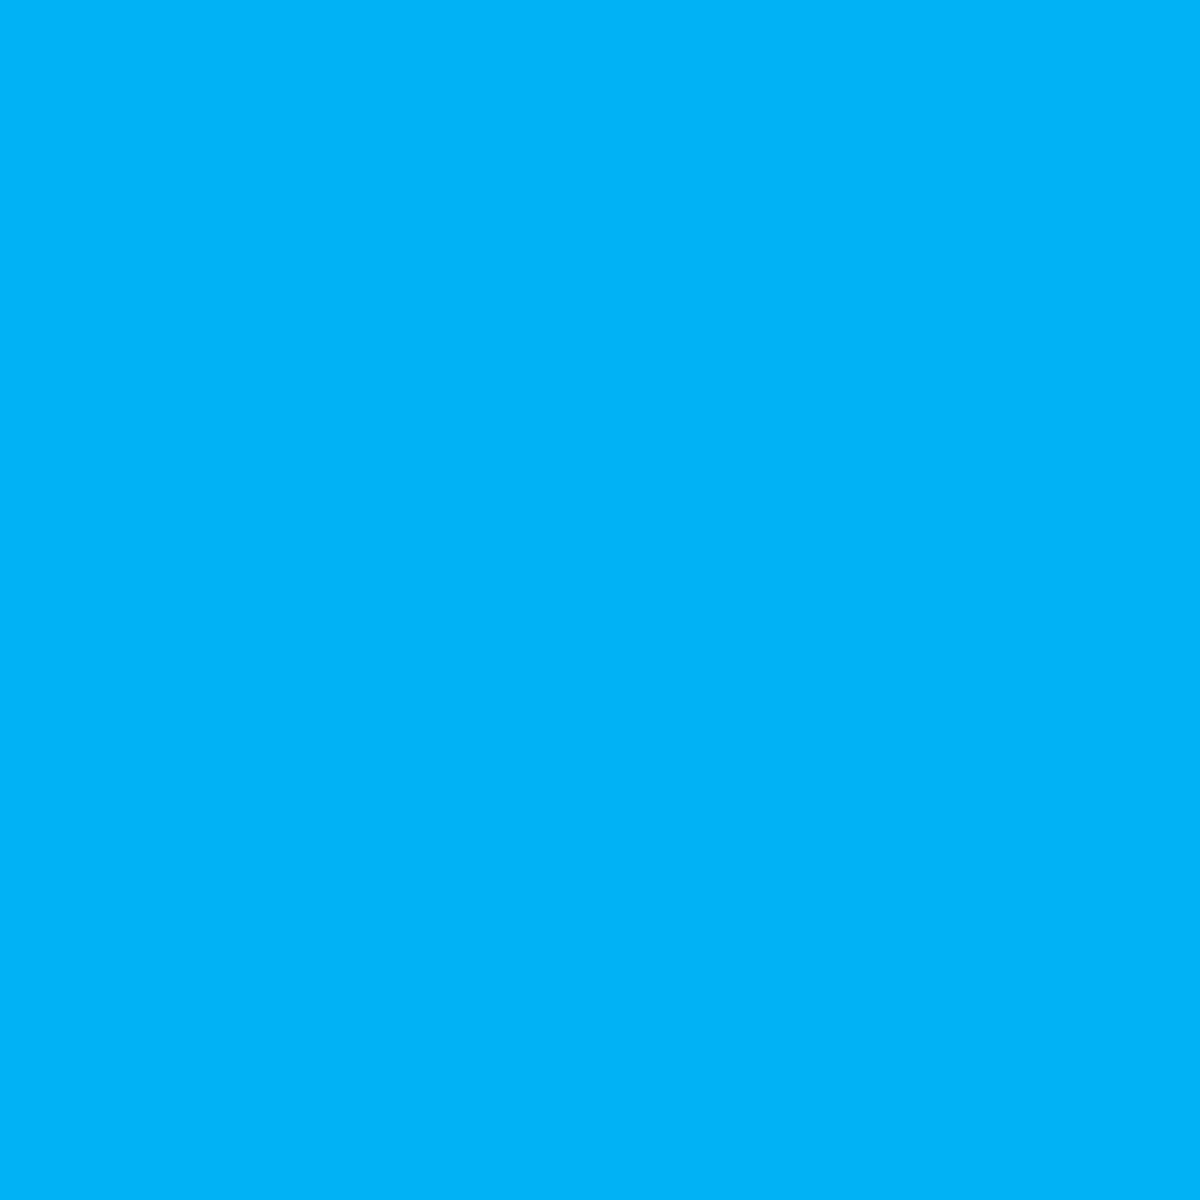 Tecido Liso Azul Turquesa